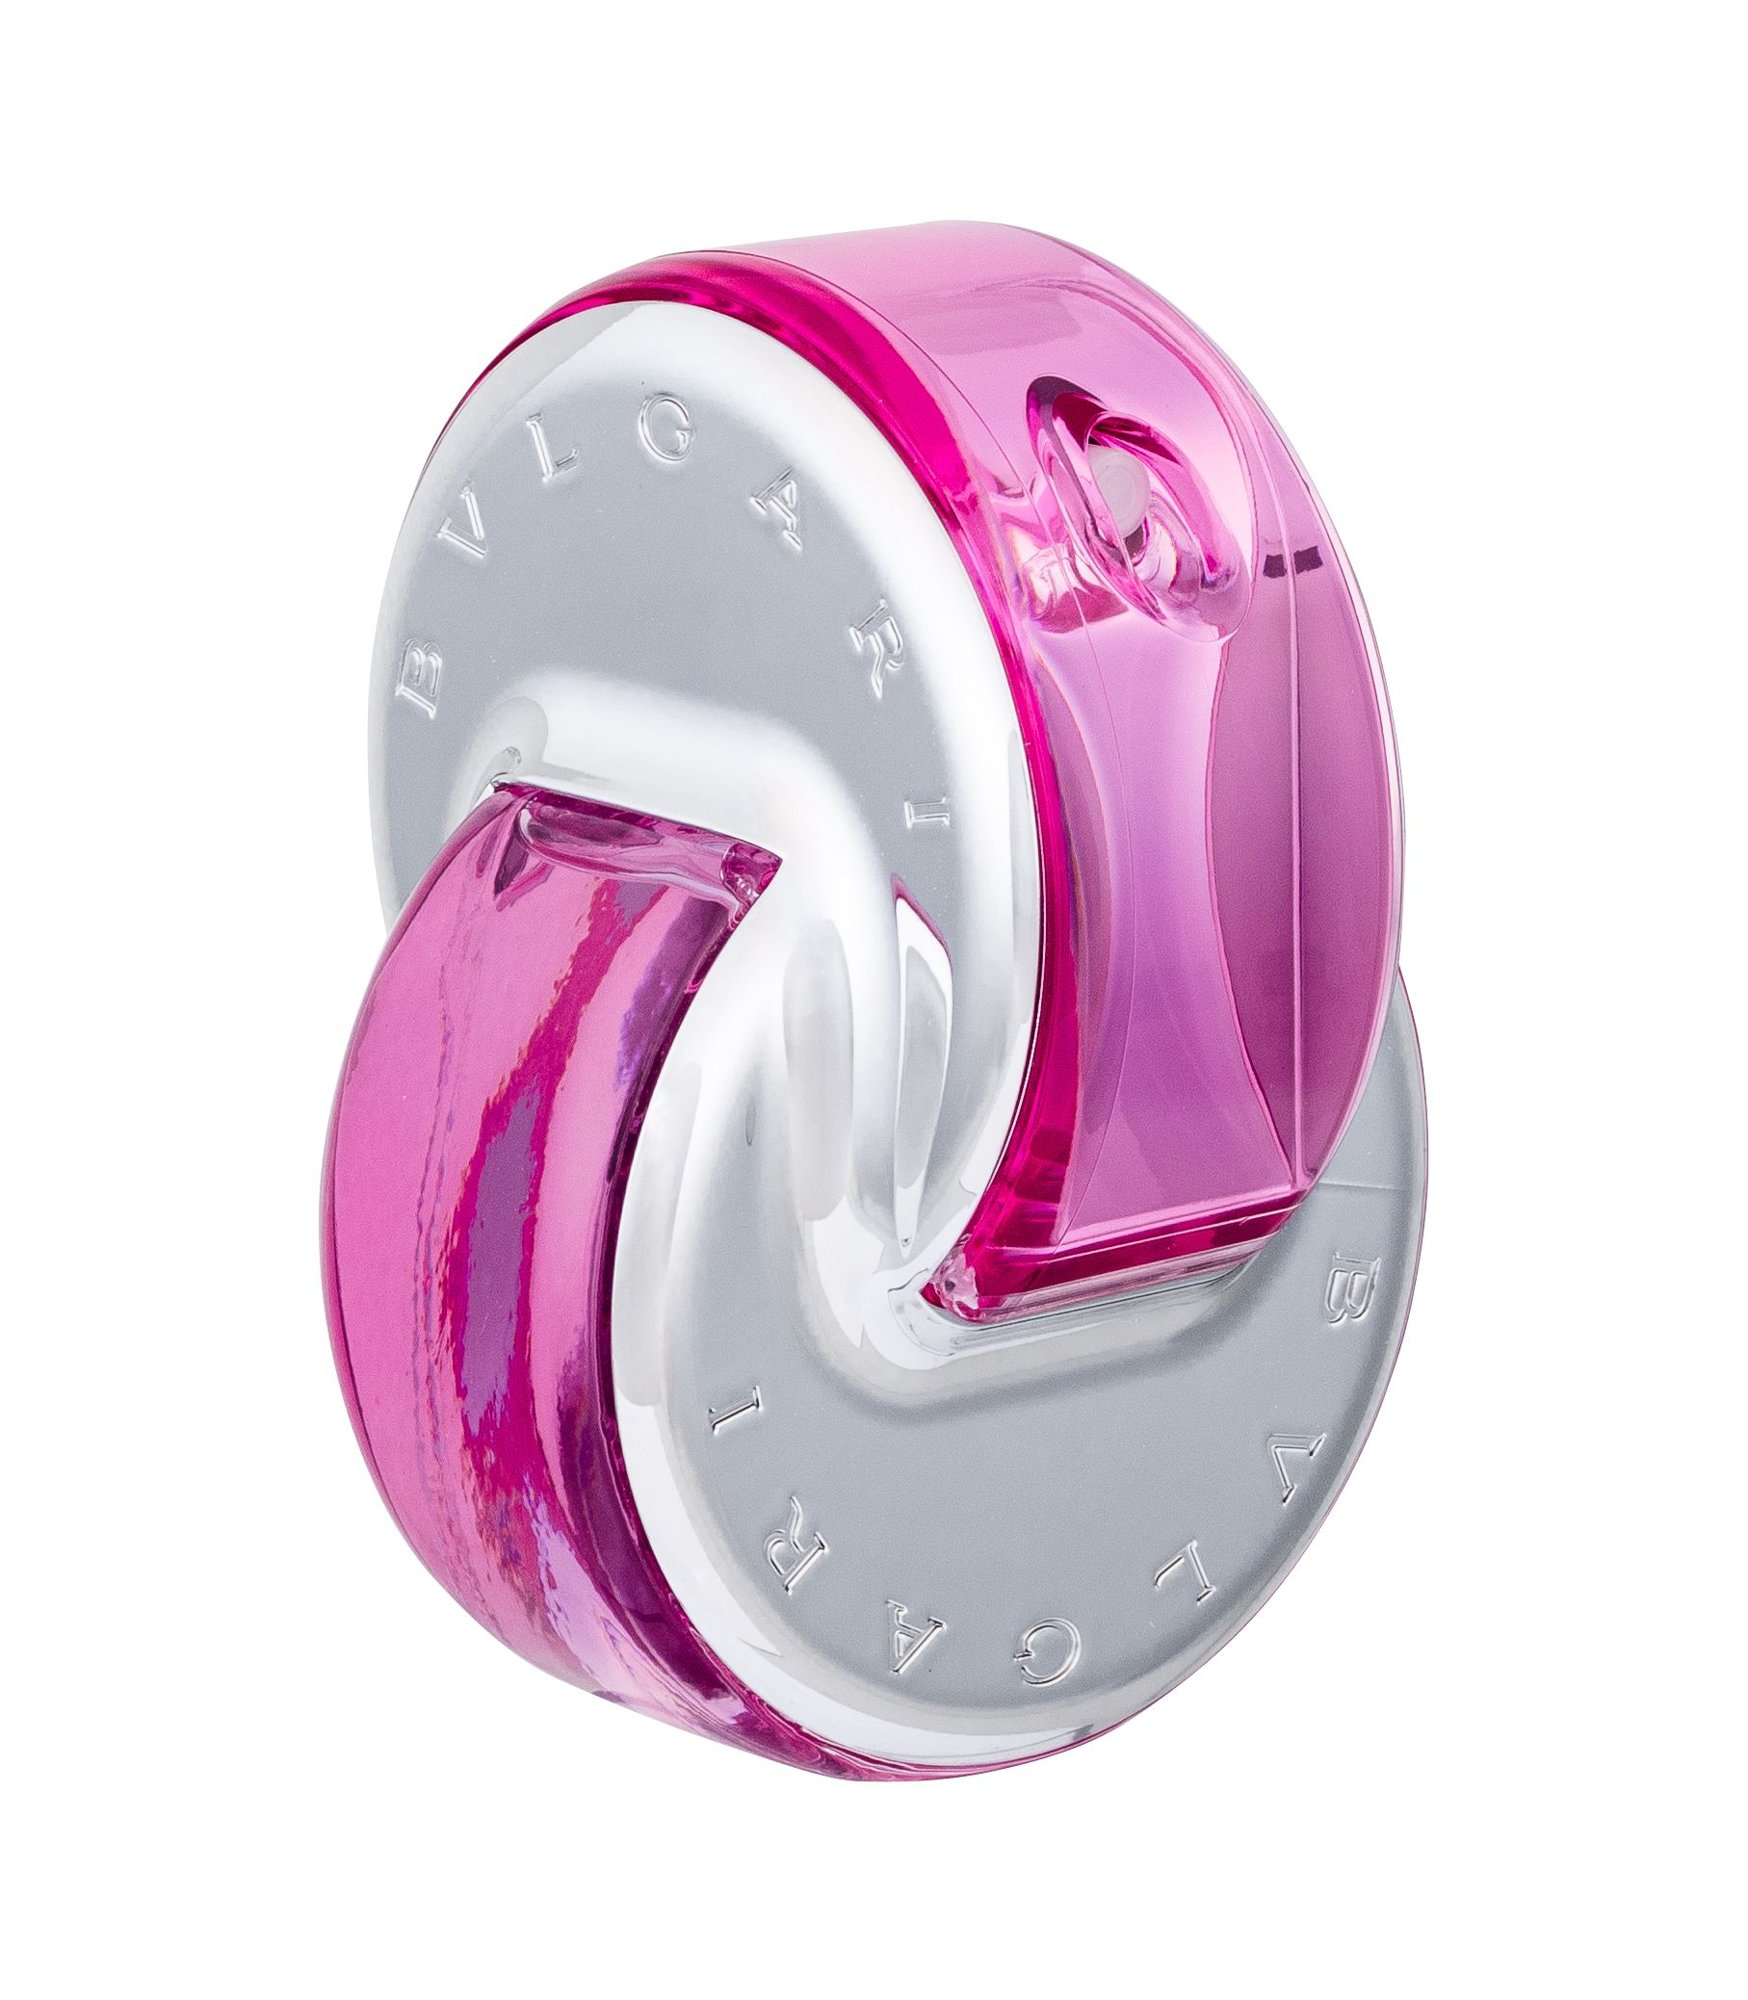 Bvlgari Omnia Pink Sapphire, Toaletní voda 65ml, Tester